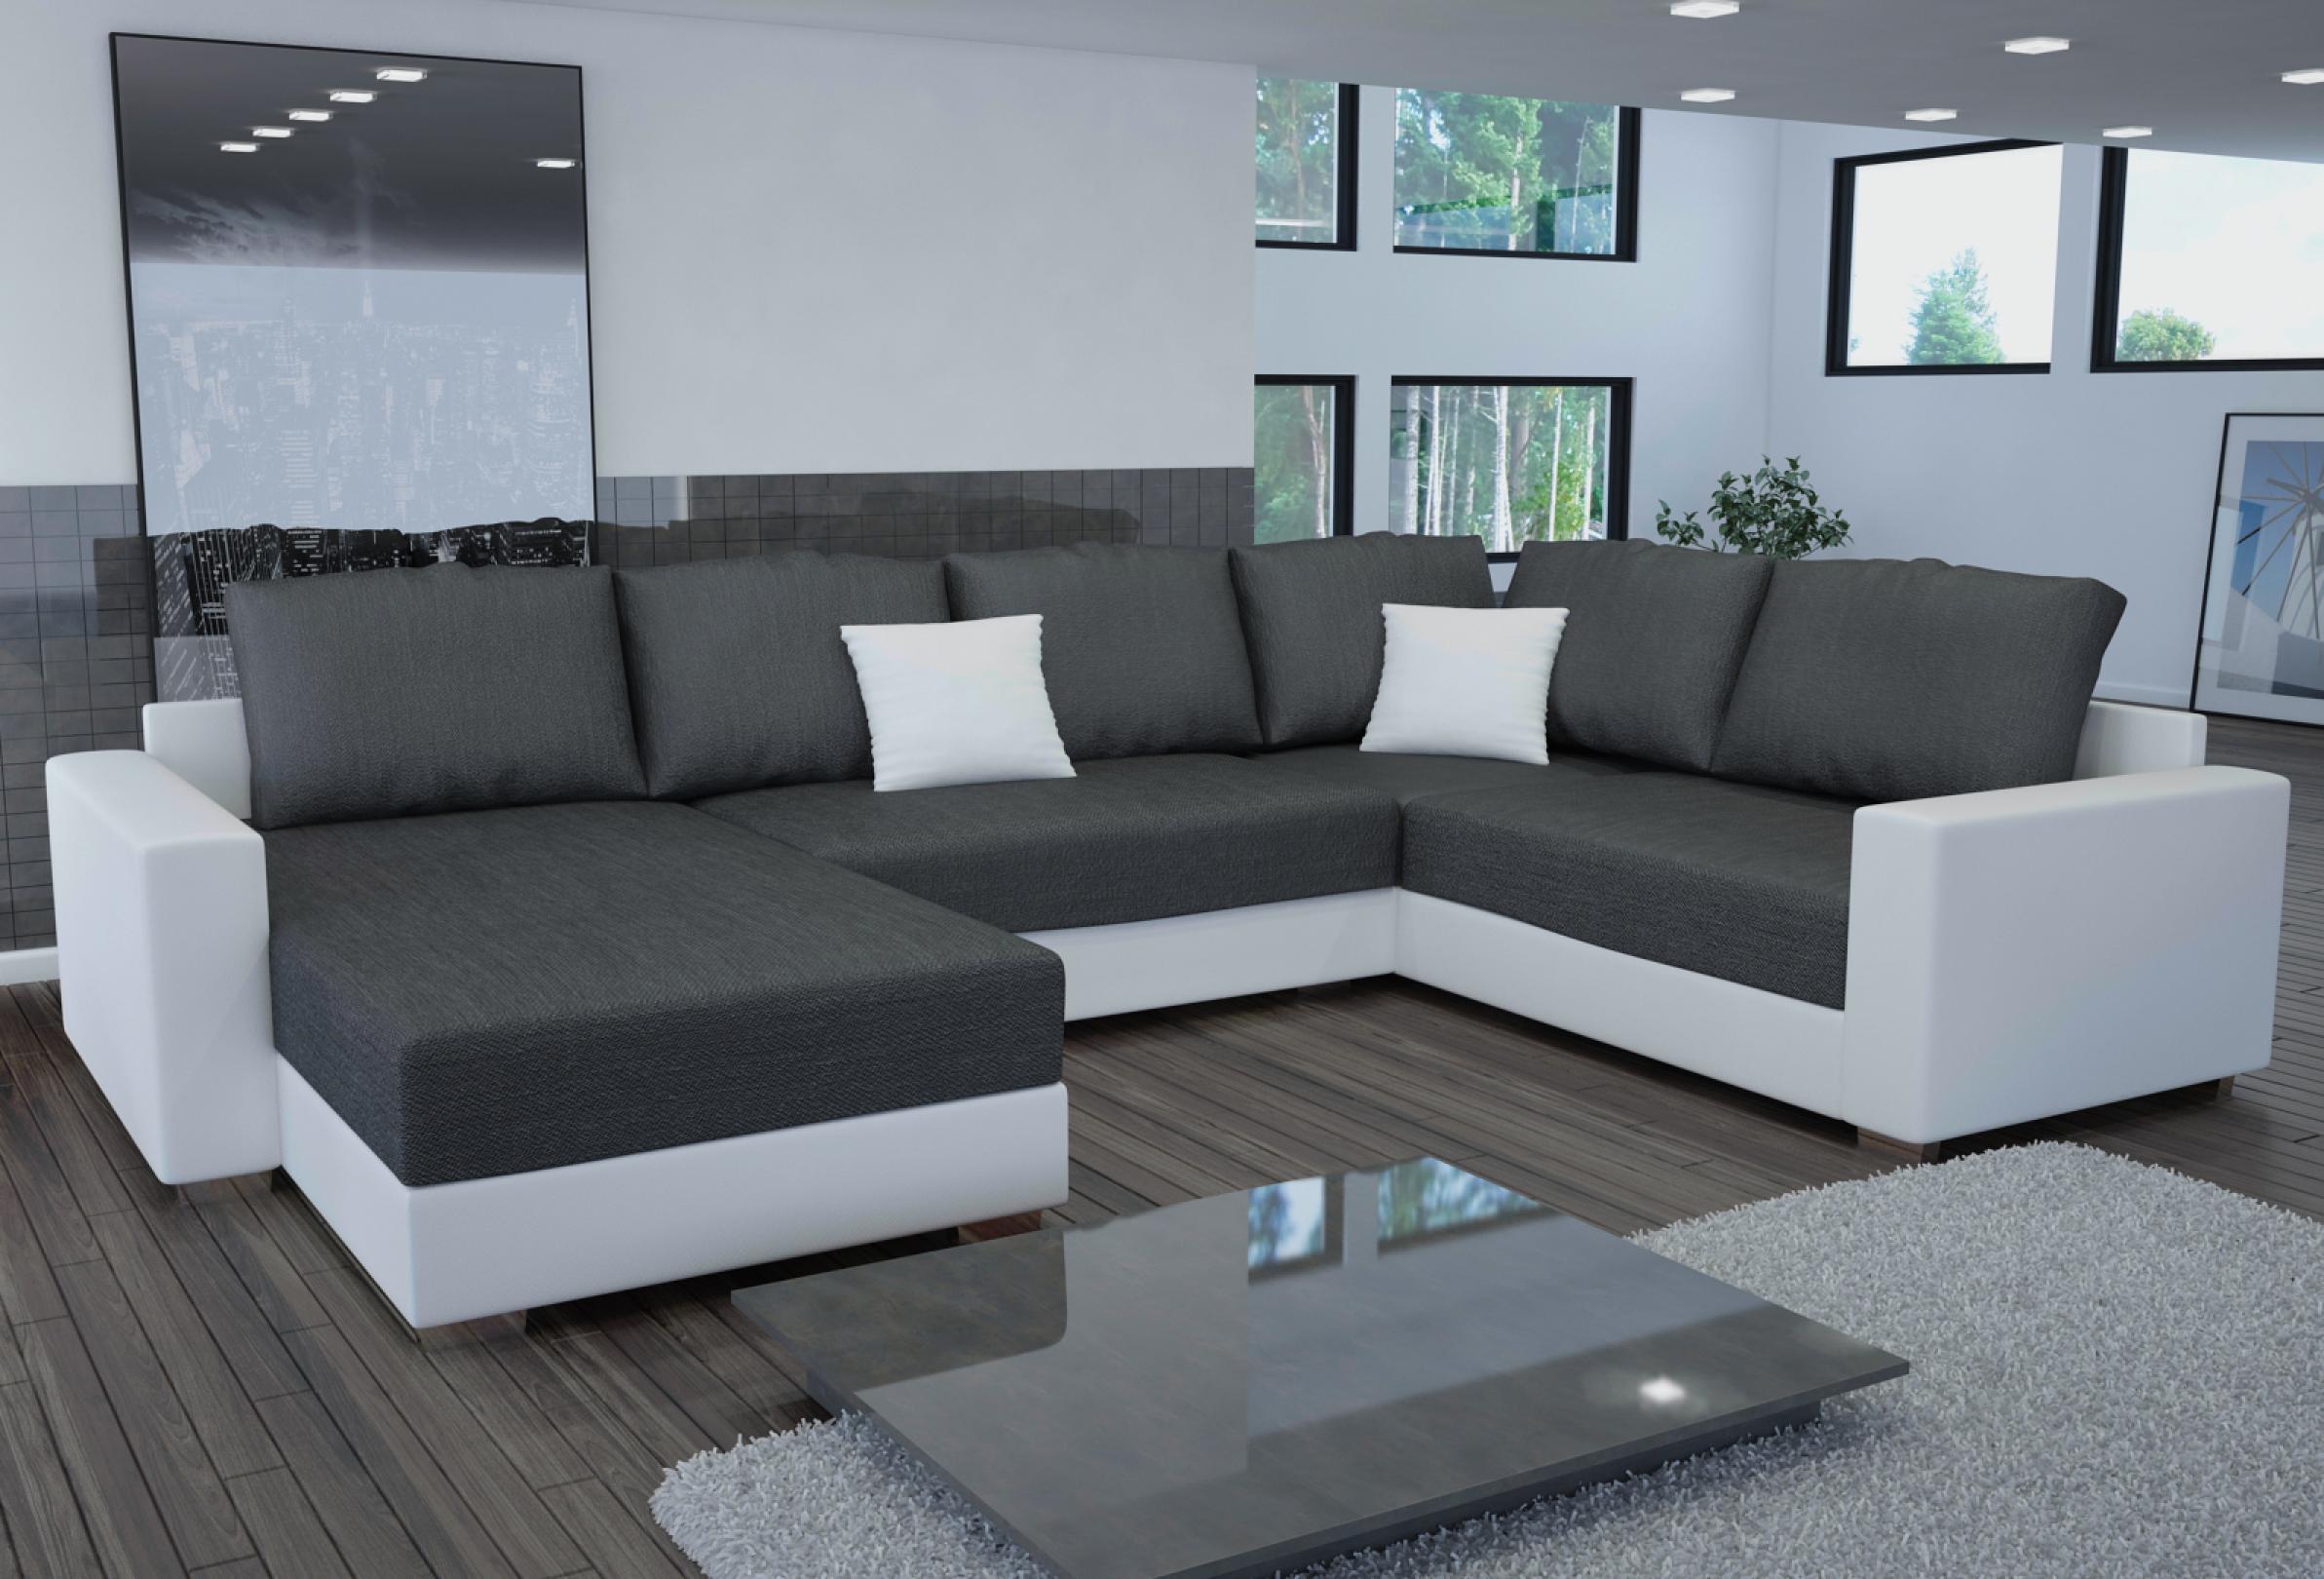 photos canap d 39 angle tissu gris et blanc. Black Bedroom Furniture Sets. Home Design Ideas